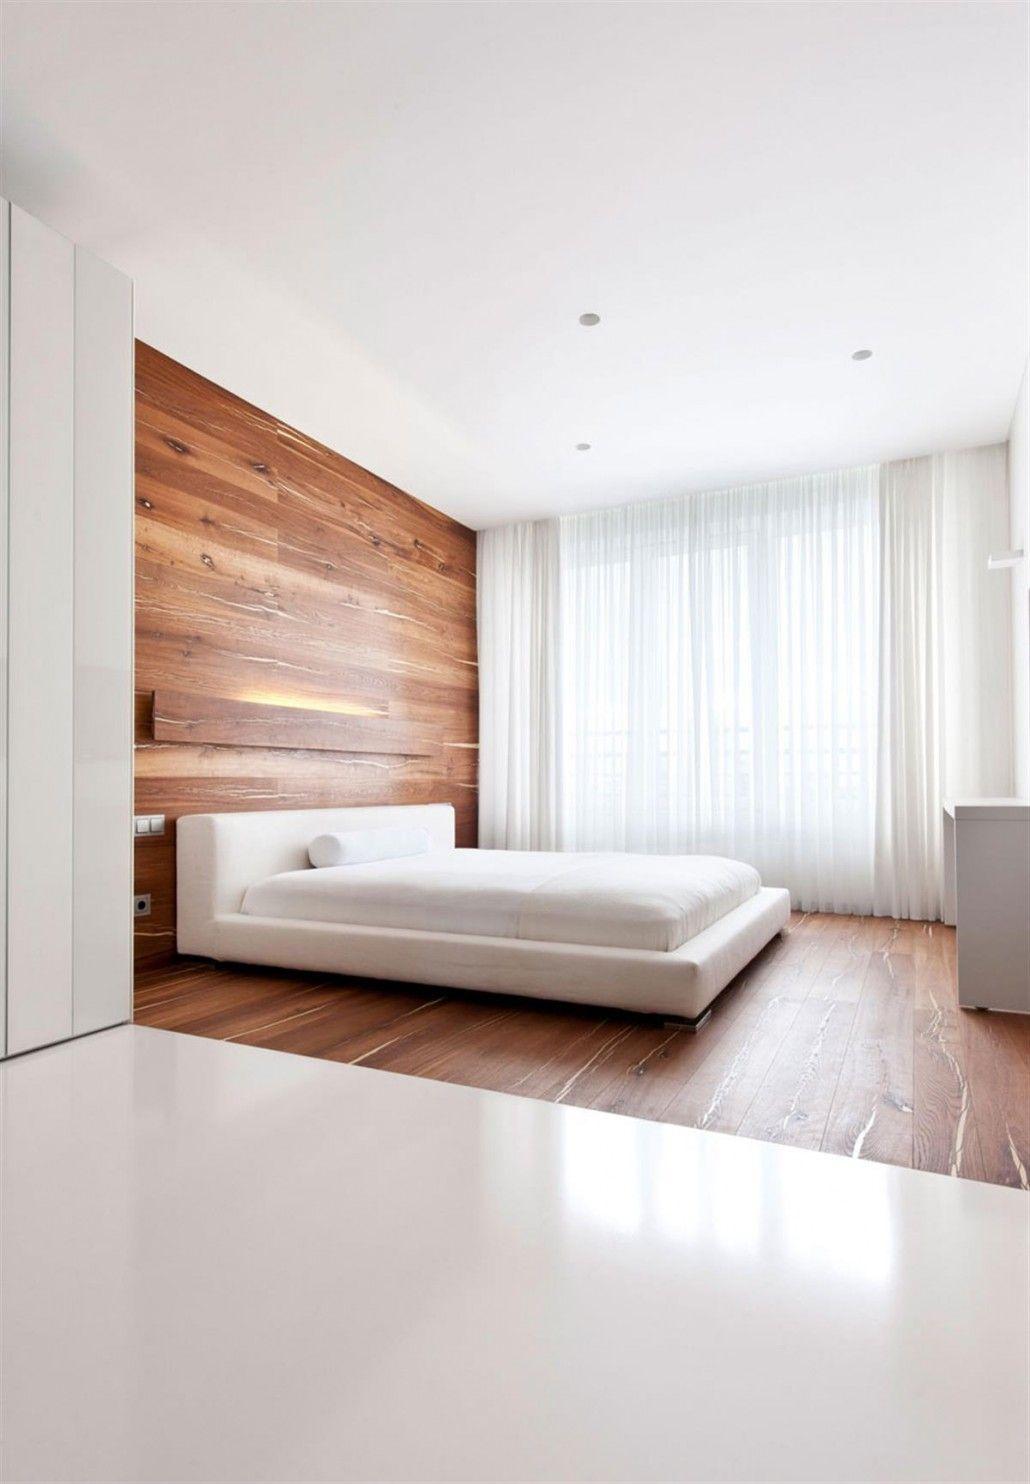 Walnut Bedroom Flooring And White Bed Design Under Recessed Lights